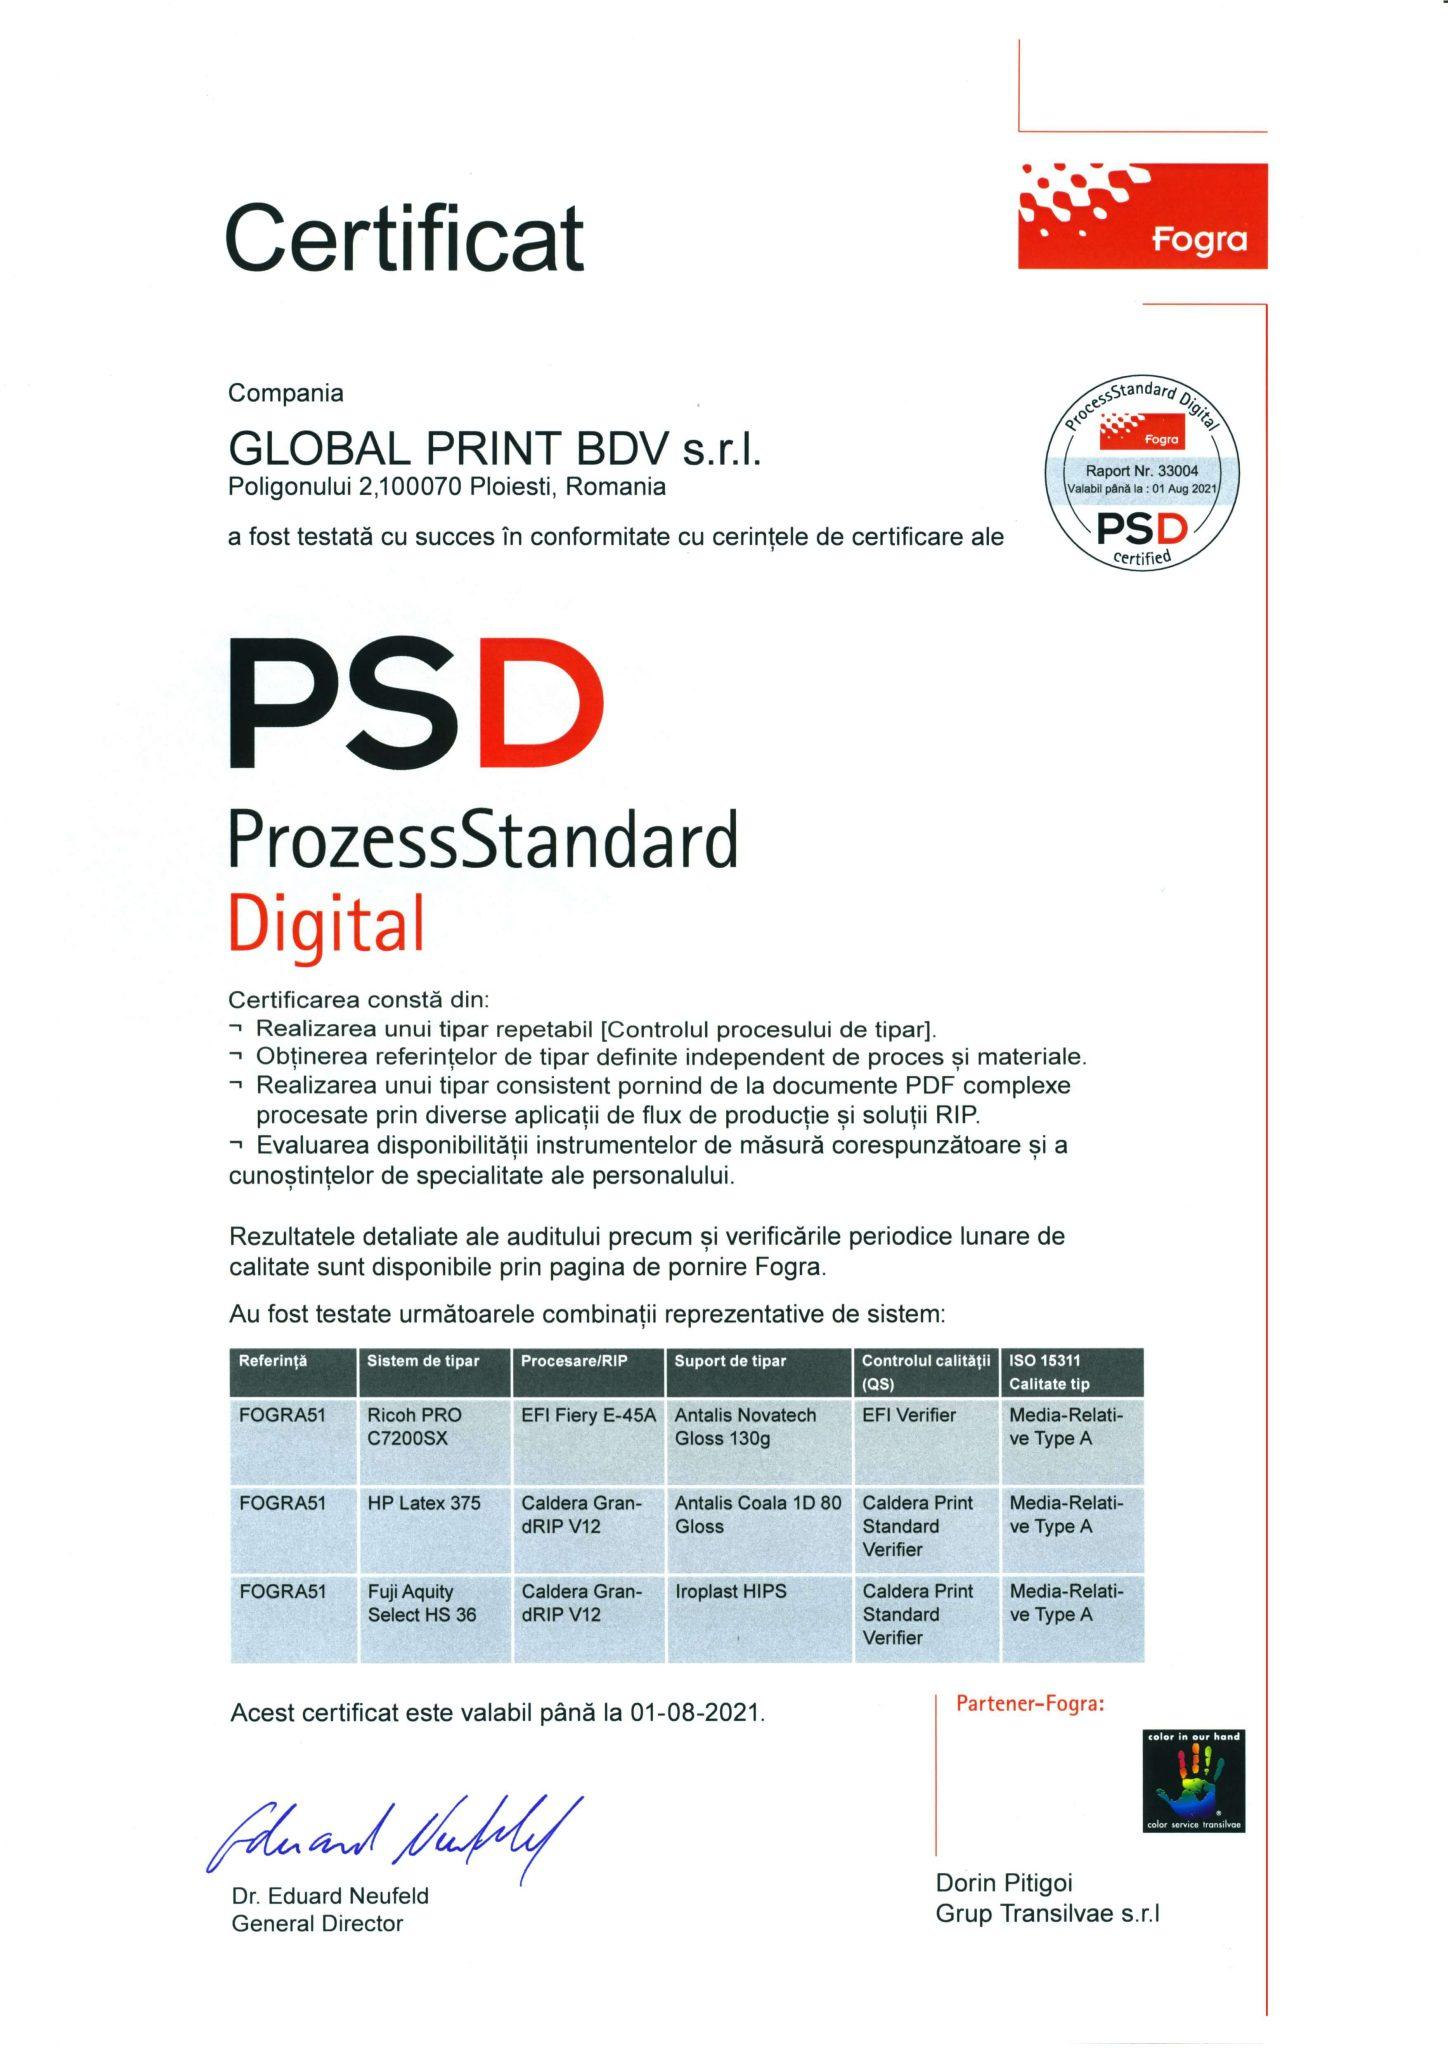 Fogra printing certification